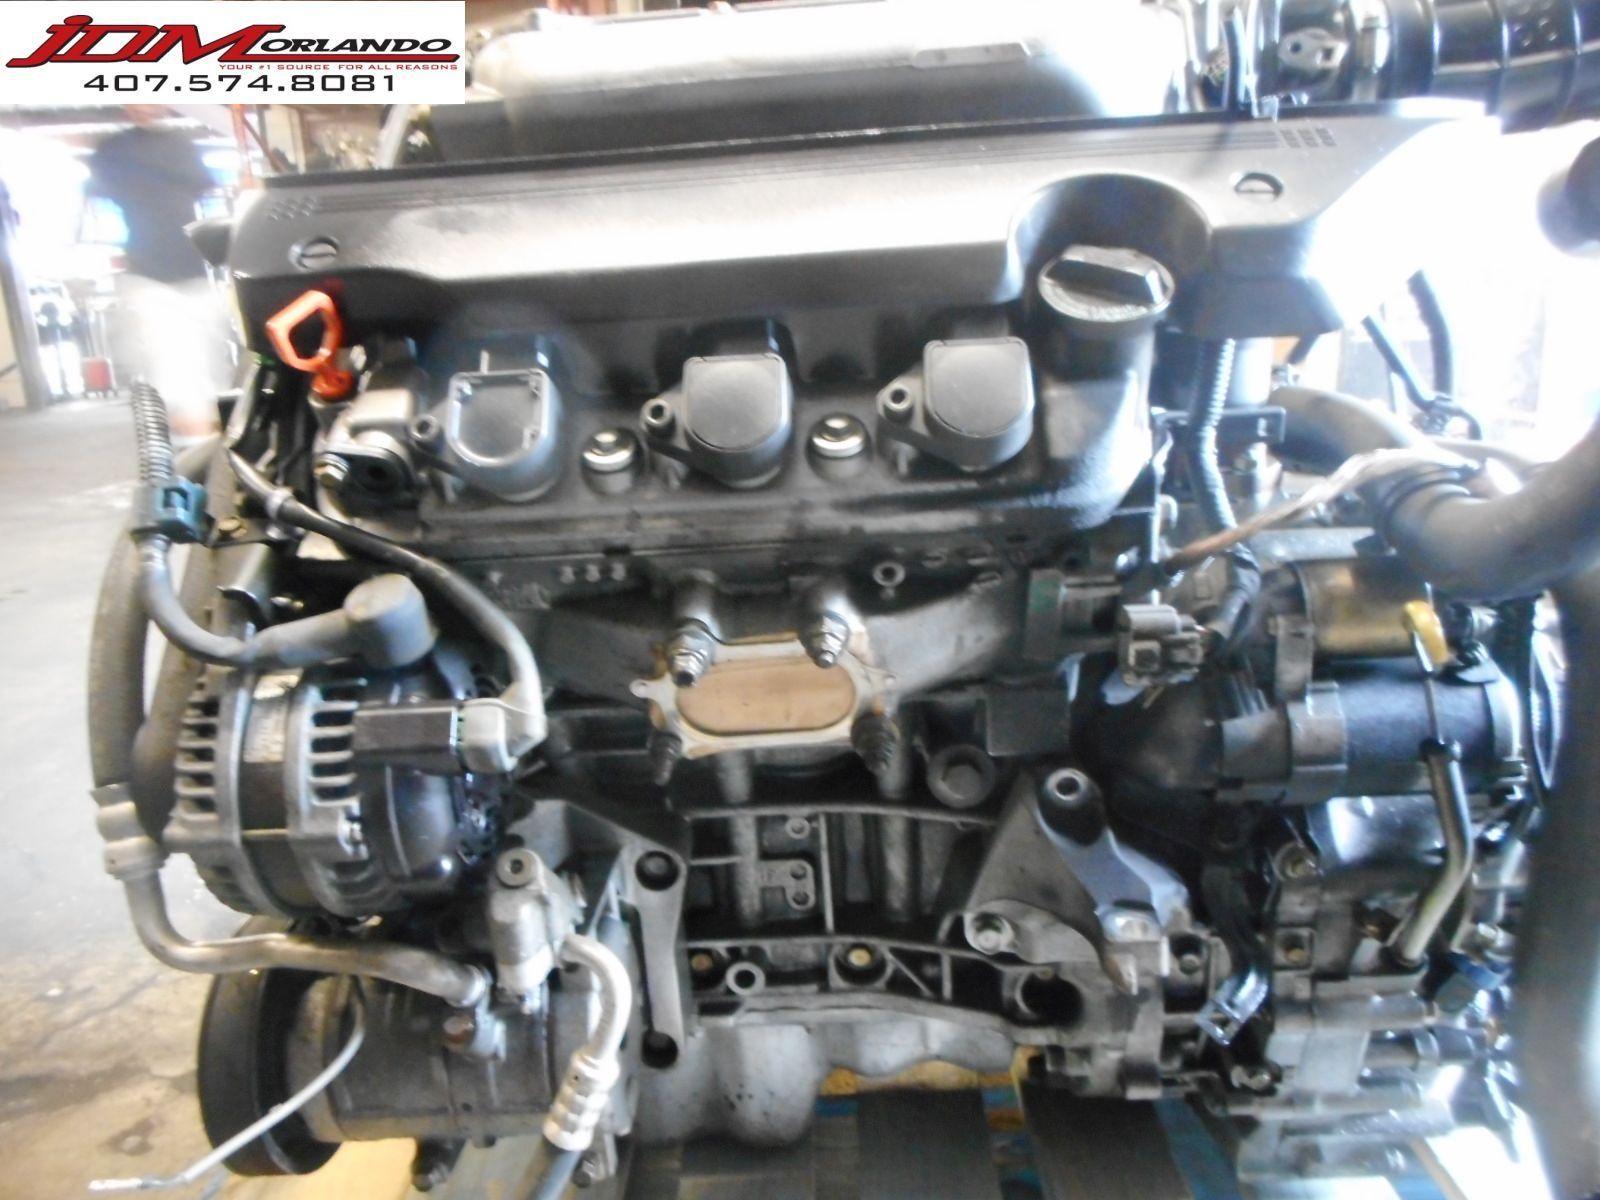 03 04 05 06 Acura Mdx 3.5l Sohc Vtec Engine JDM J35A